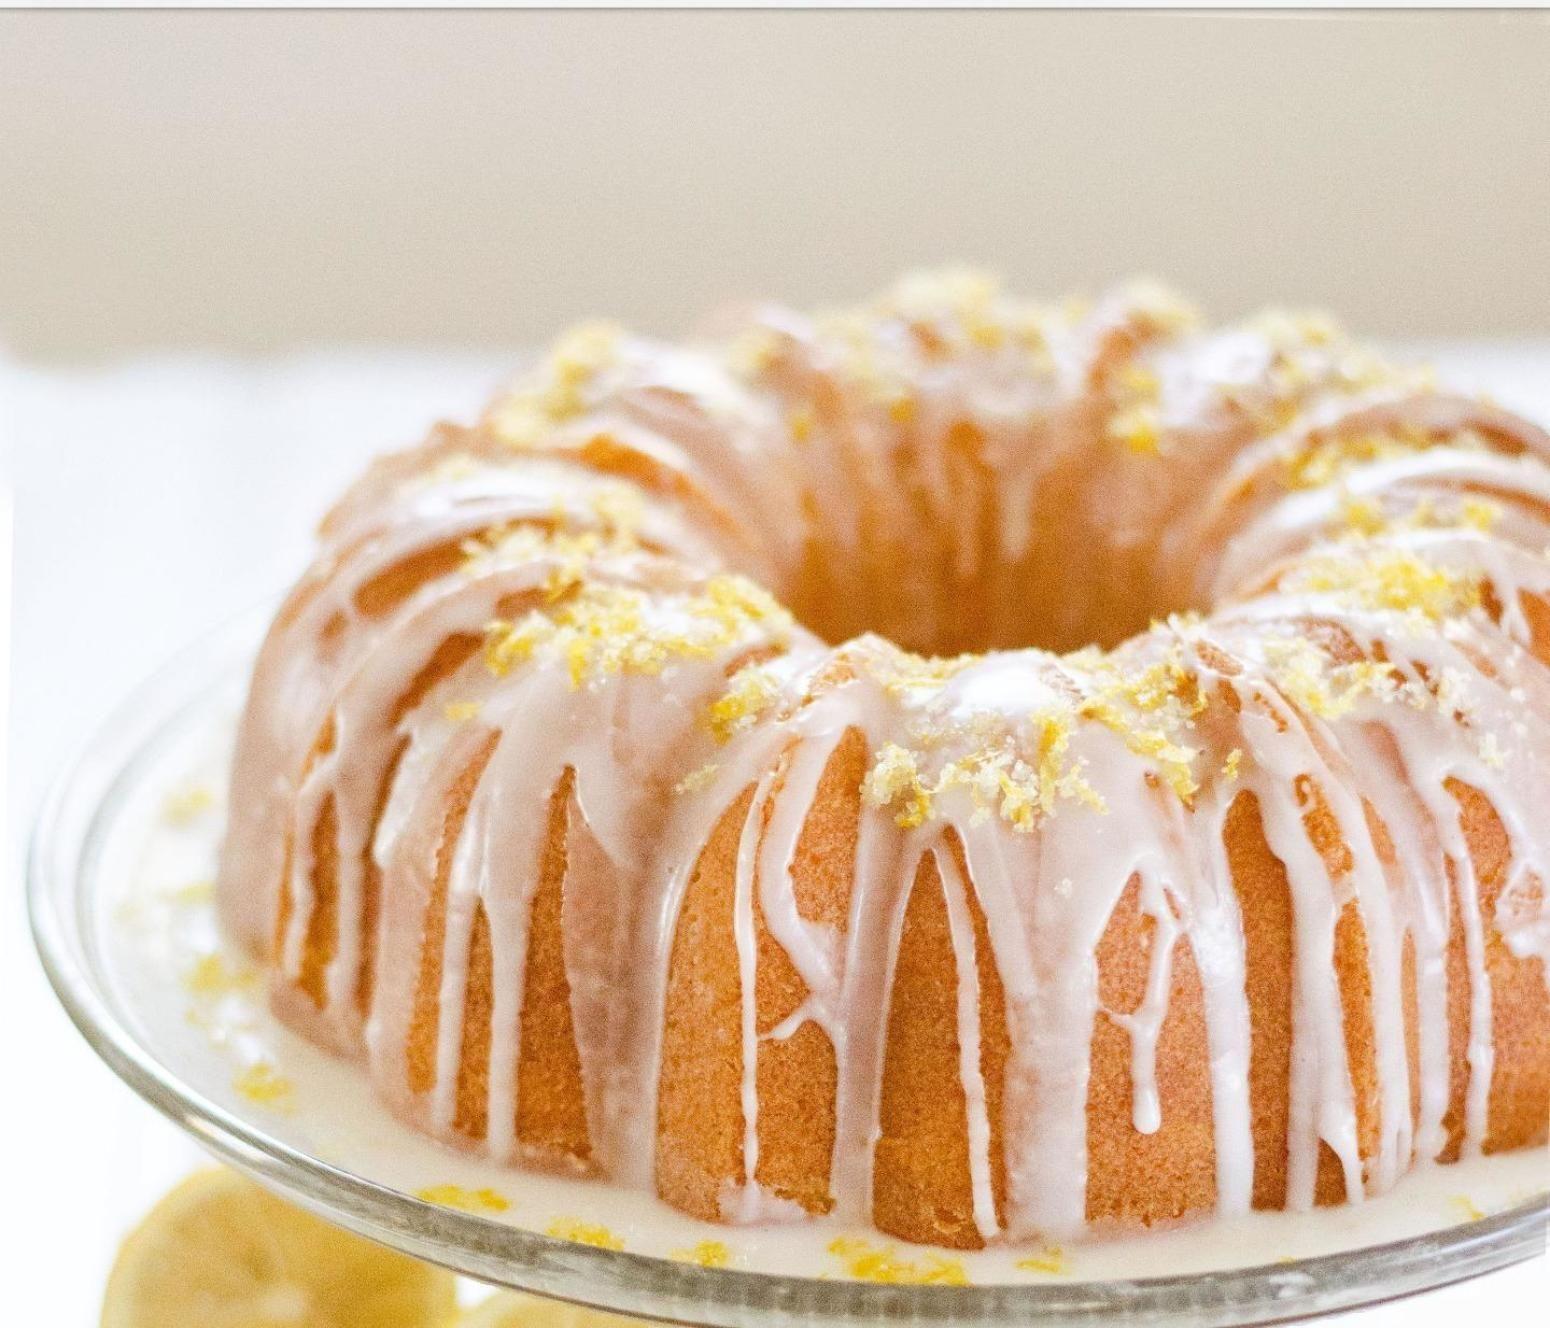 Super Moist Buttermilk Lemon Pound Cake With Glaze Lemon Pound Cake Recipe Lemon Cake Recipe Lemon Buttermilk Pound Cake